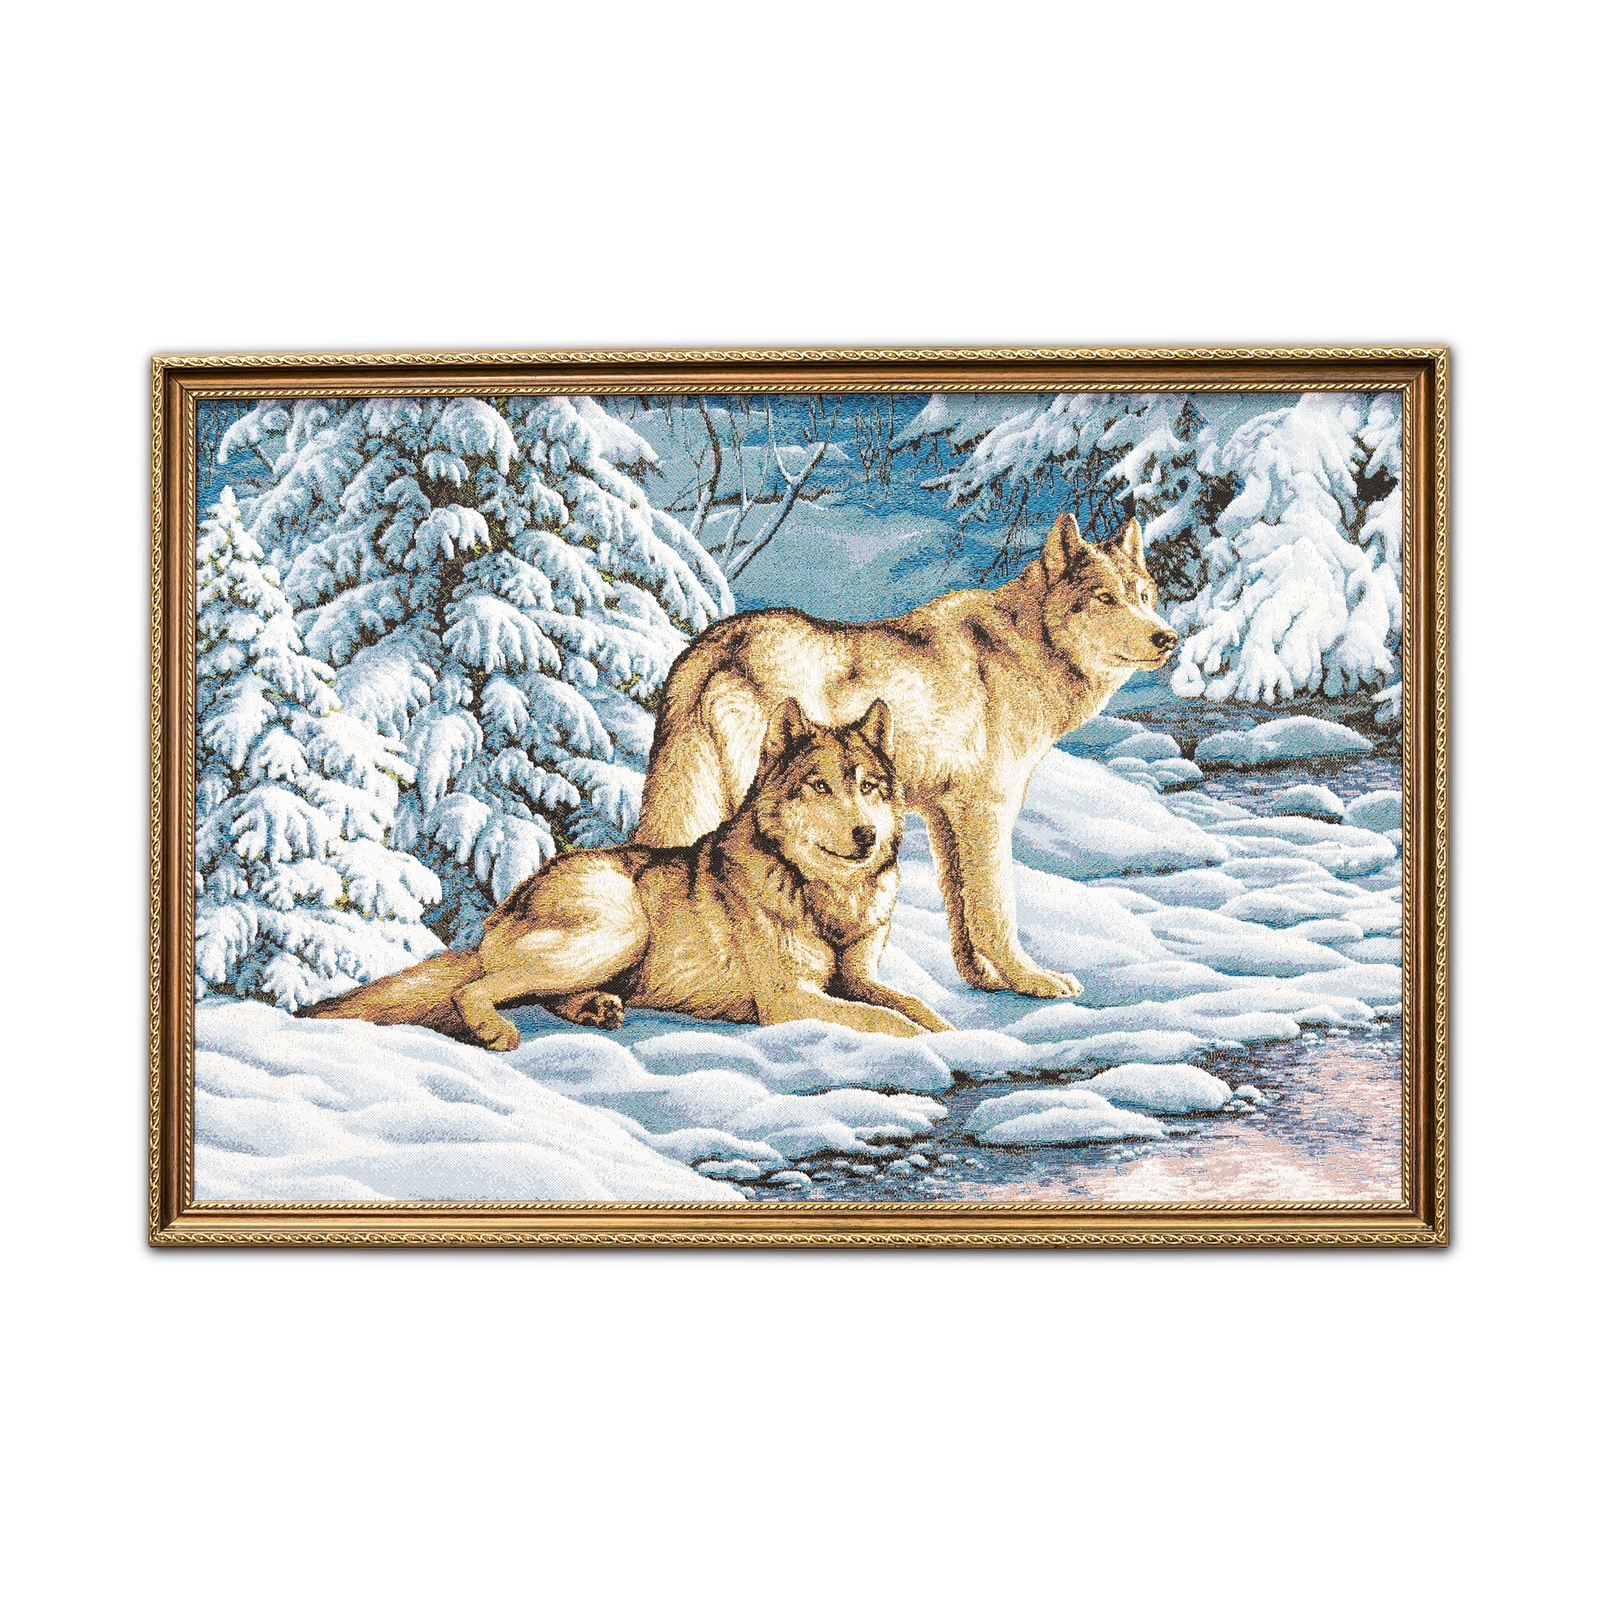 цена Картина Магазин гобеленов серые волки 52*75 см, Гобелен онлайн в 2017 году